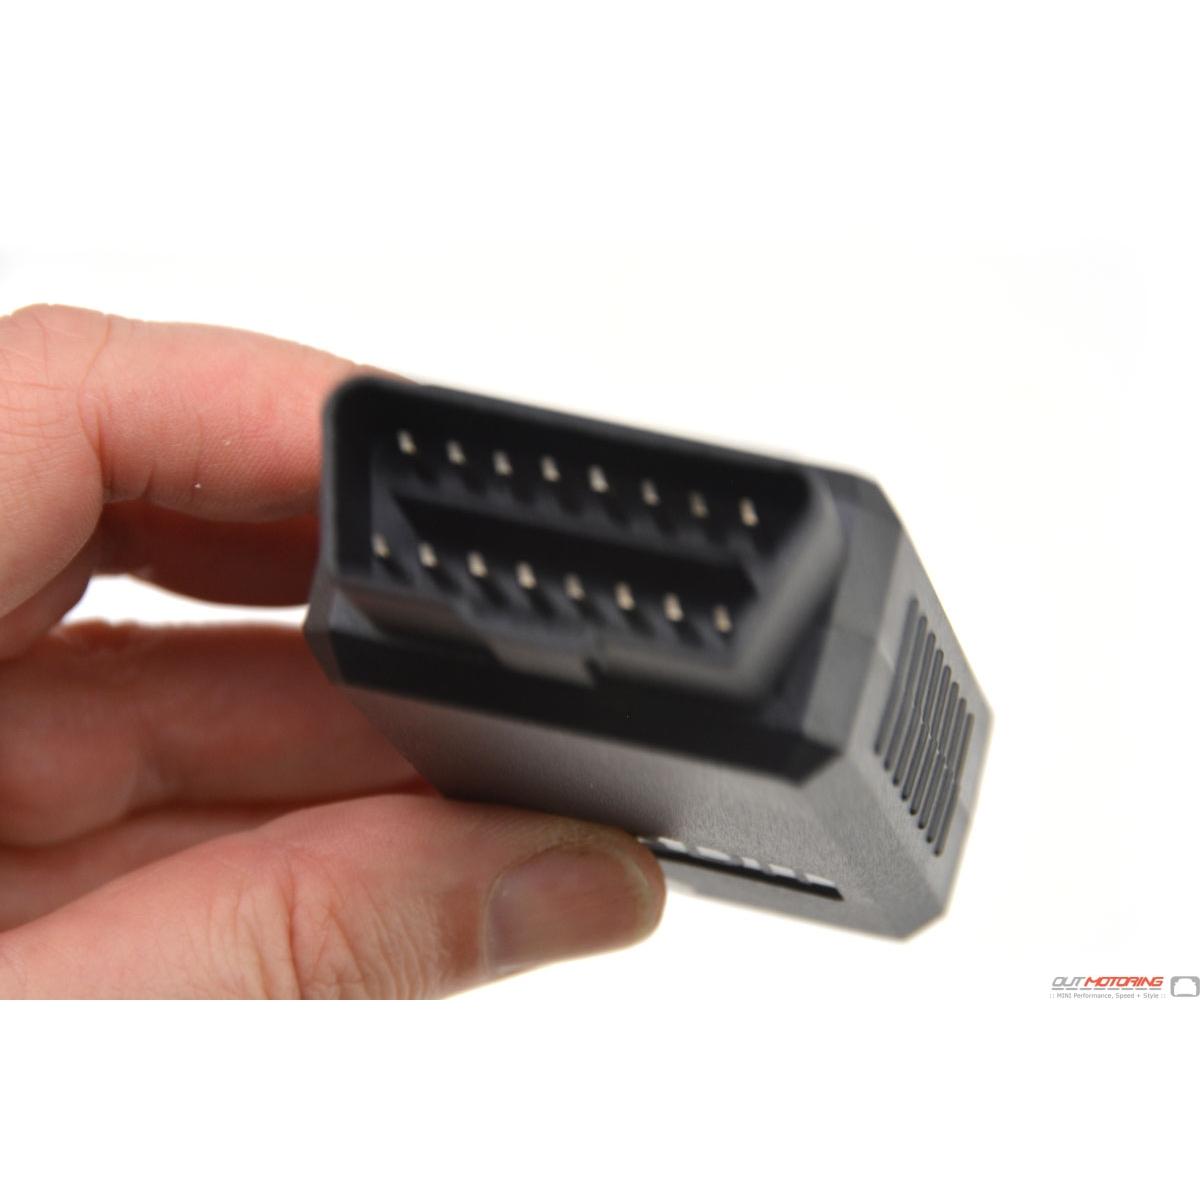 Bluetooth OBD Code Reader - MINI Cooper Accessories + MINI